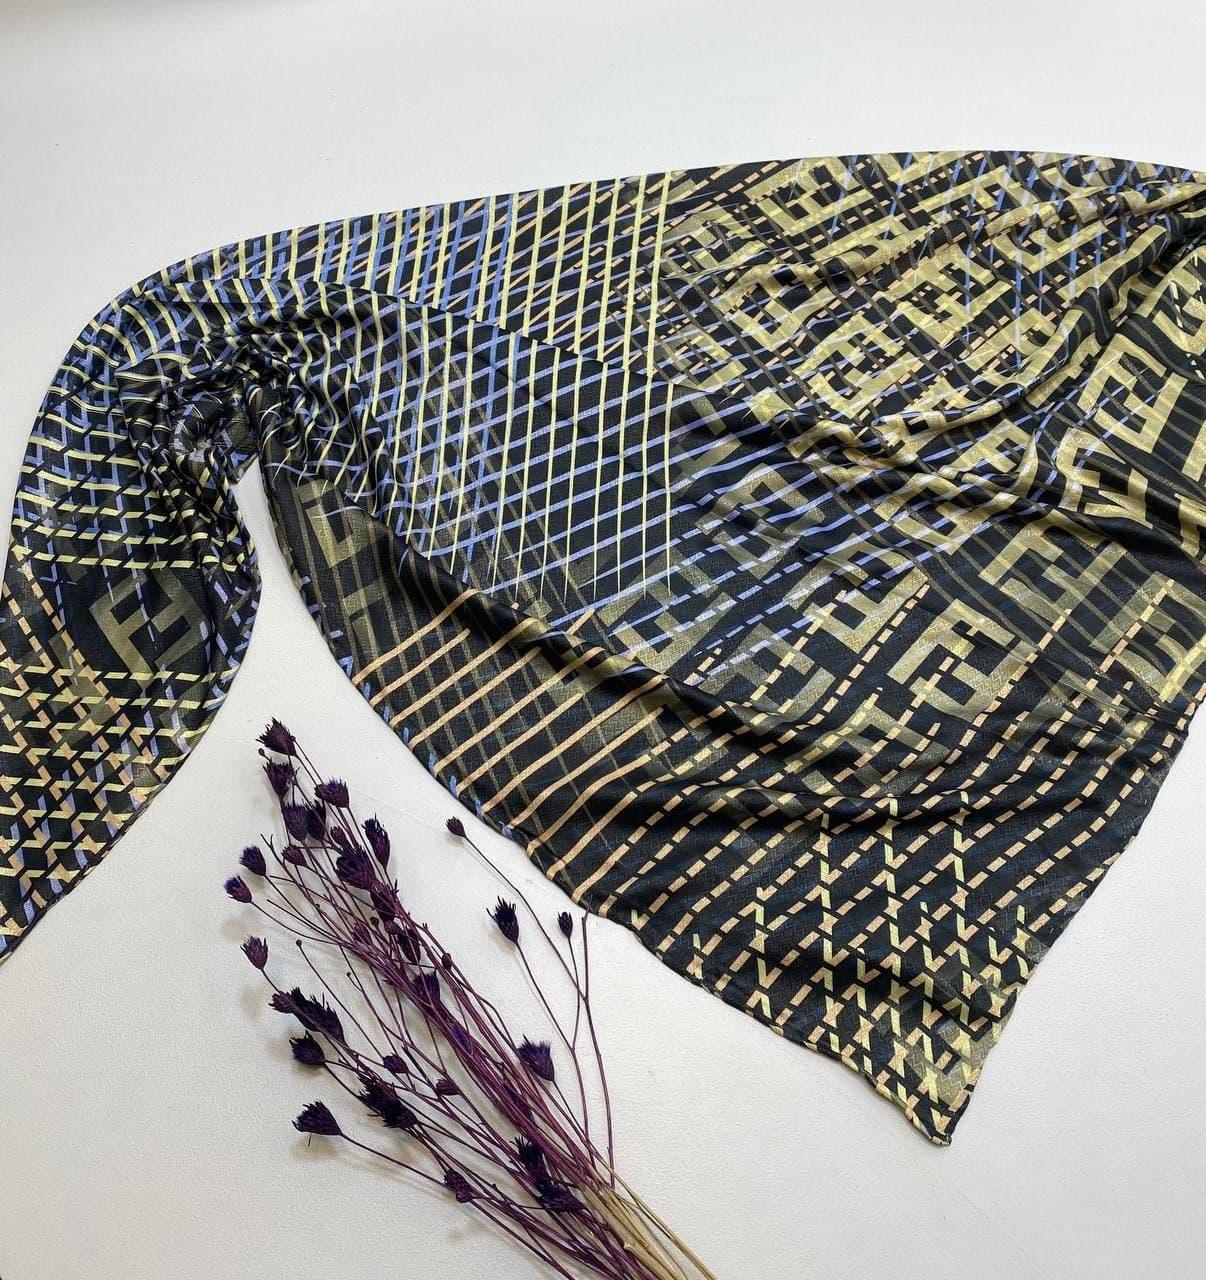 روسری دیجیتالی